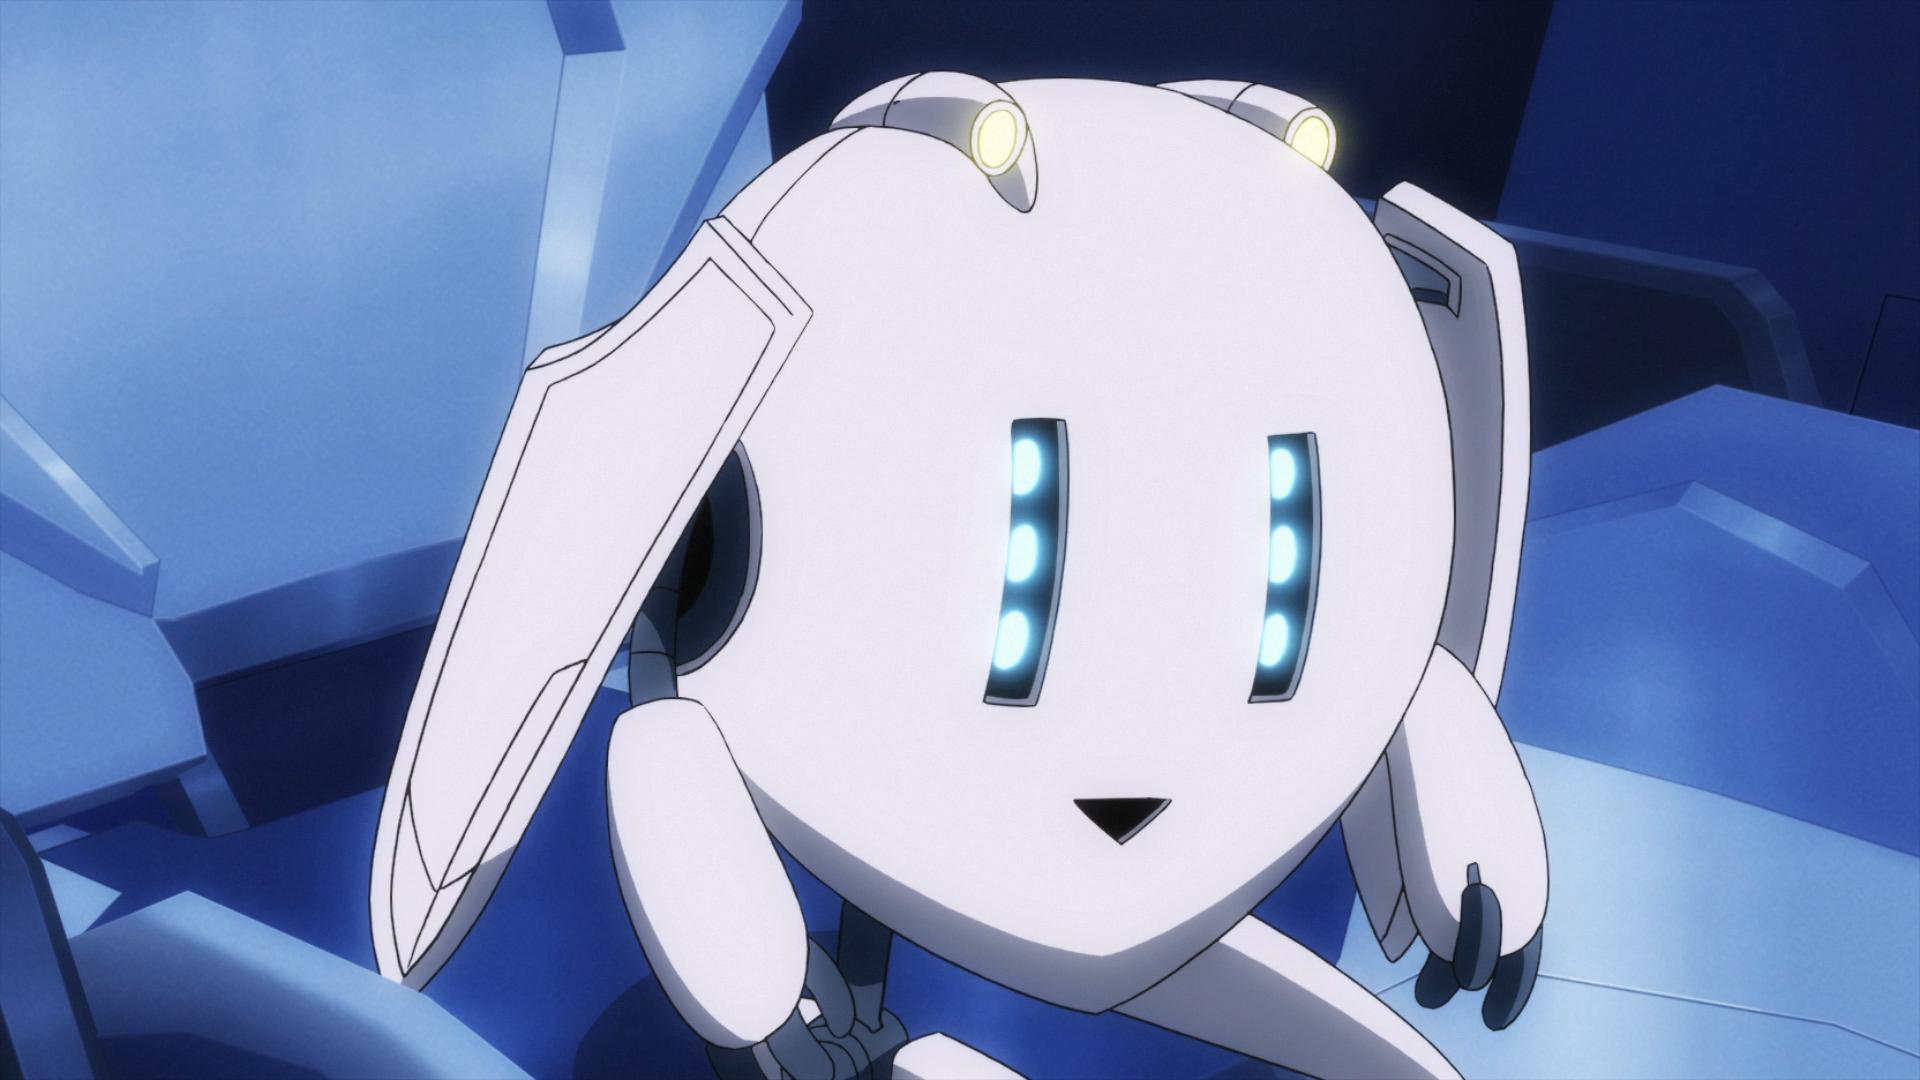 [Golumpa] Space Battleship Tiramisu - 11 (Uchuu Senkan